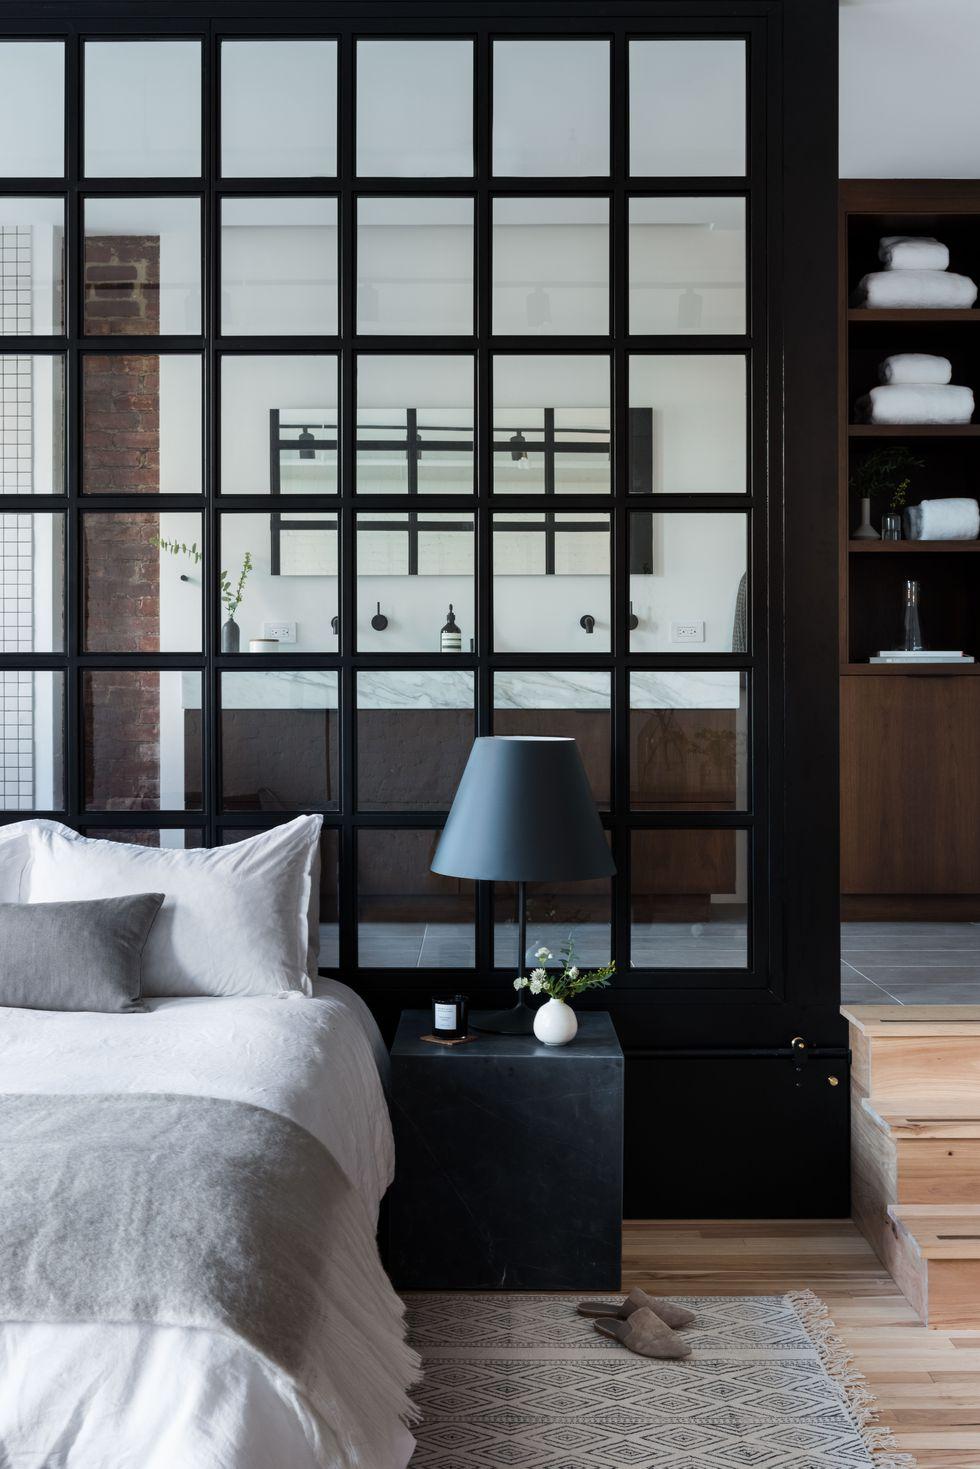 luxe stoere badkamer glazen scheidingswand